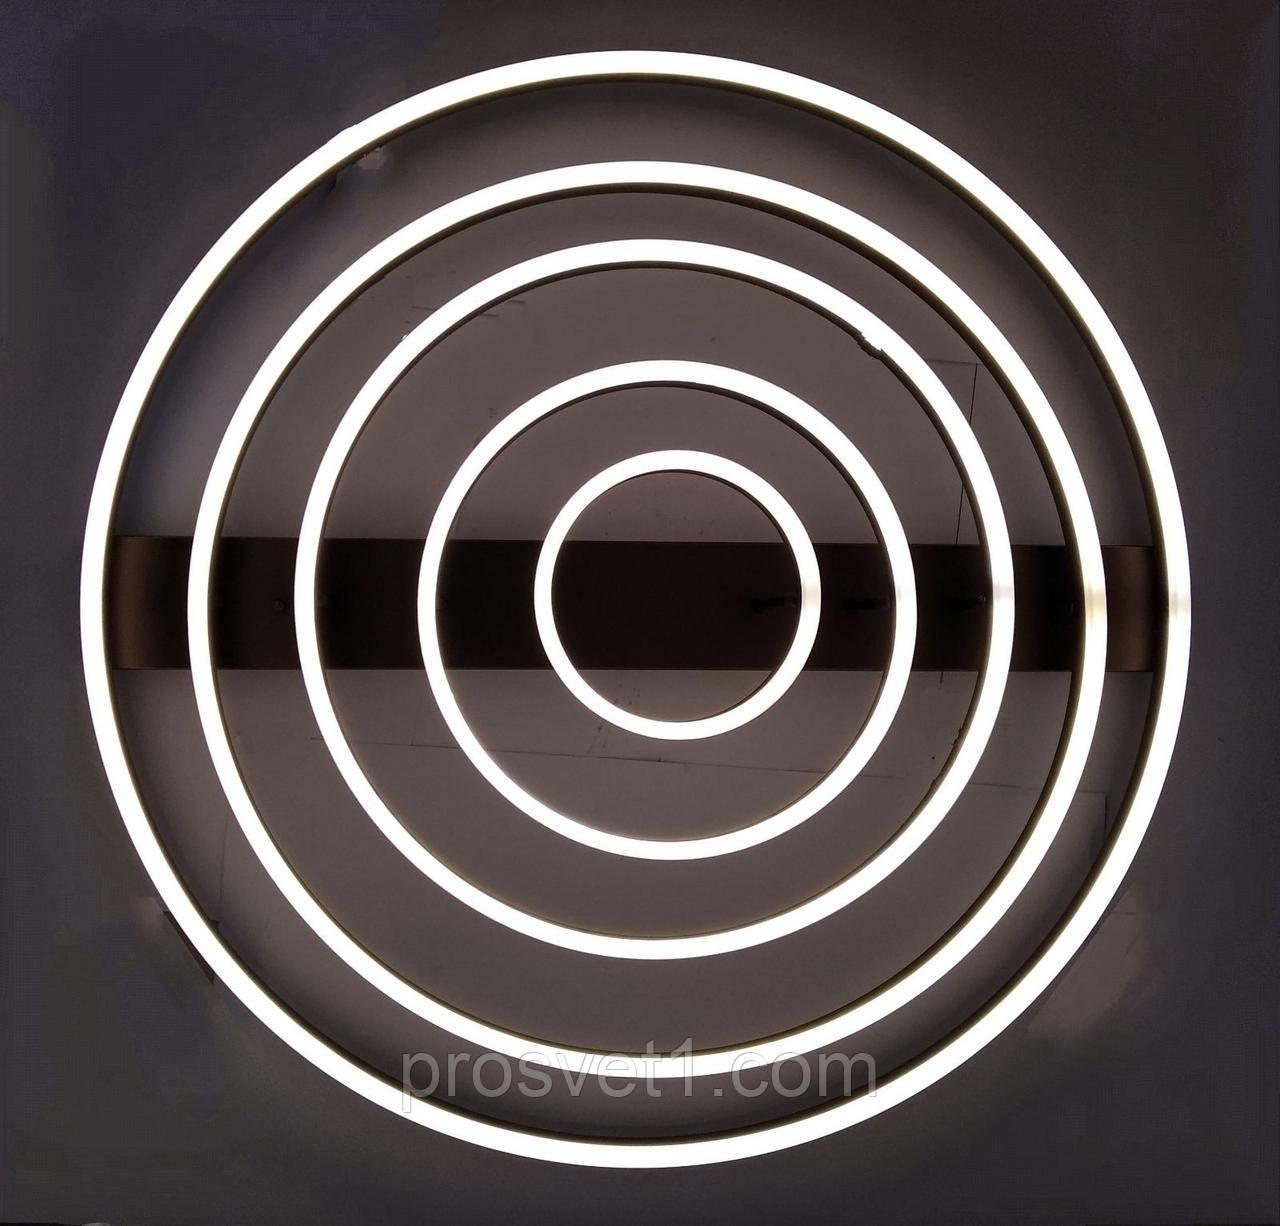 Люстра светодиодная круги (B7703 CF 374W)